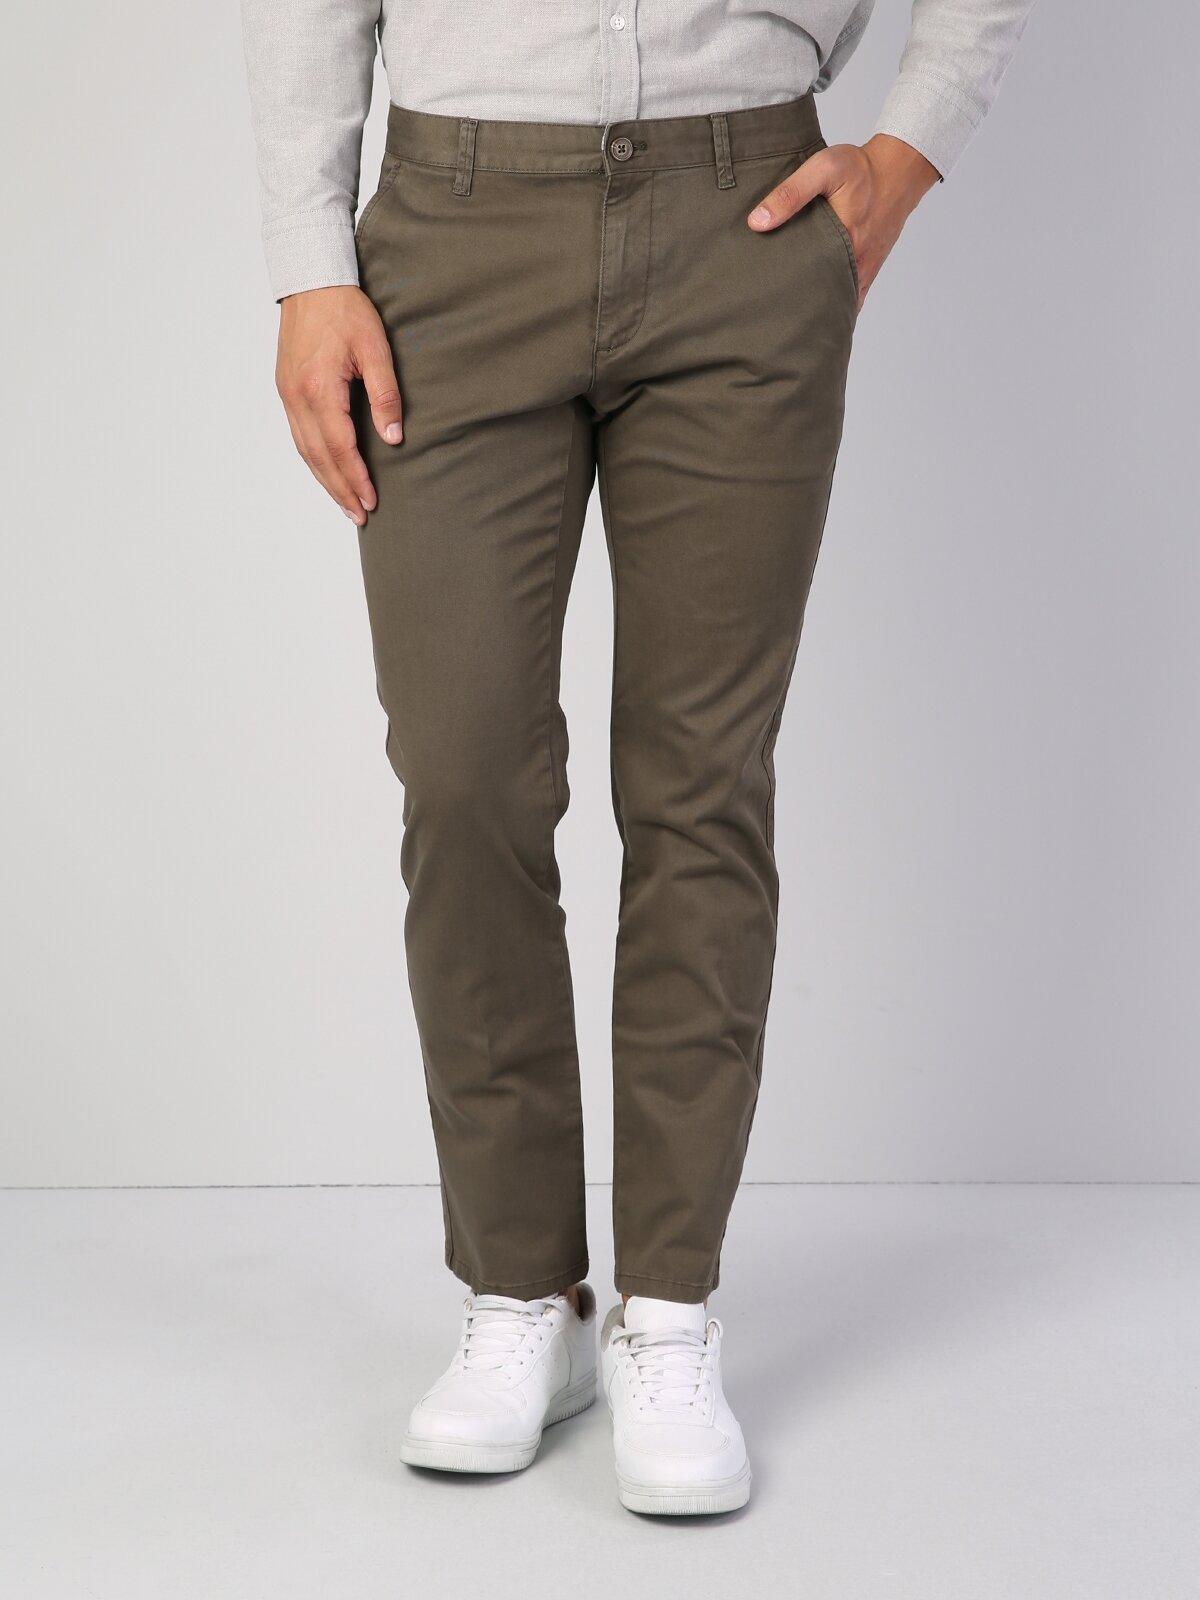 Regular Fit Orta Bel Düz Paça  Erkek Açık Haki Pantolon